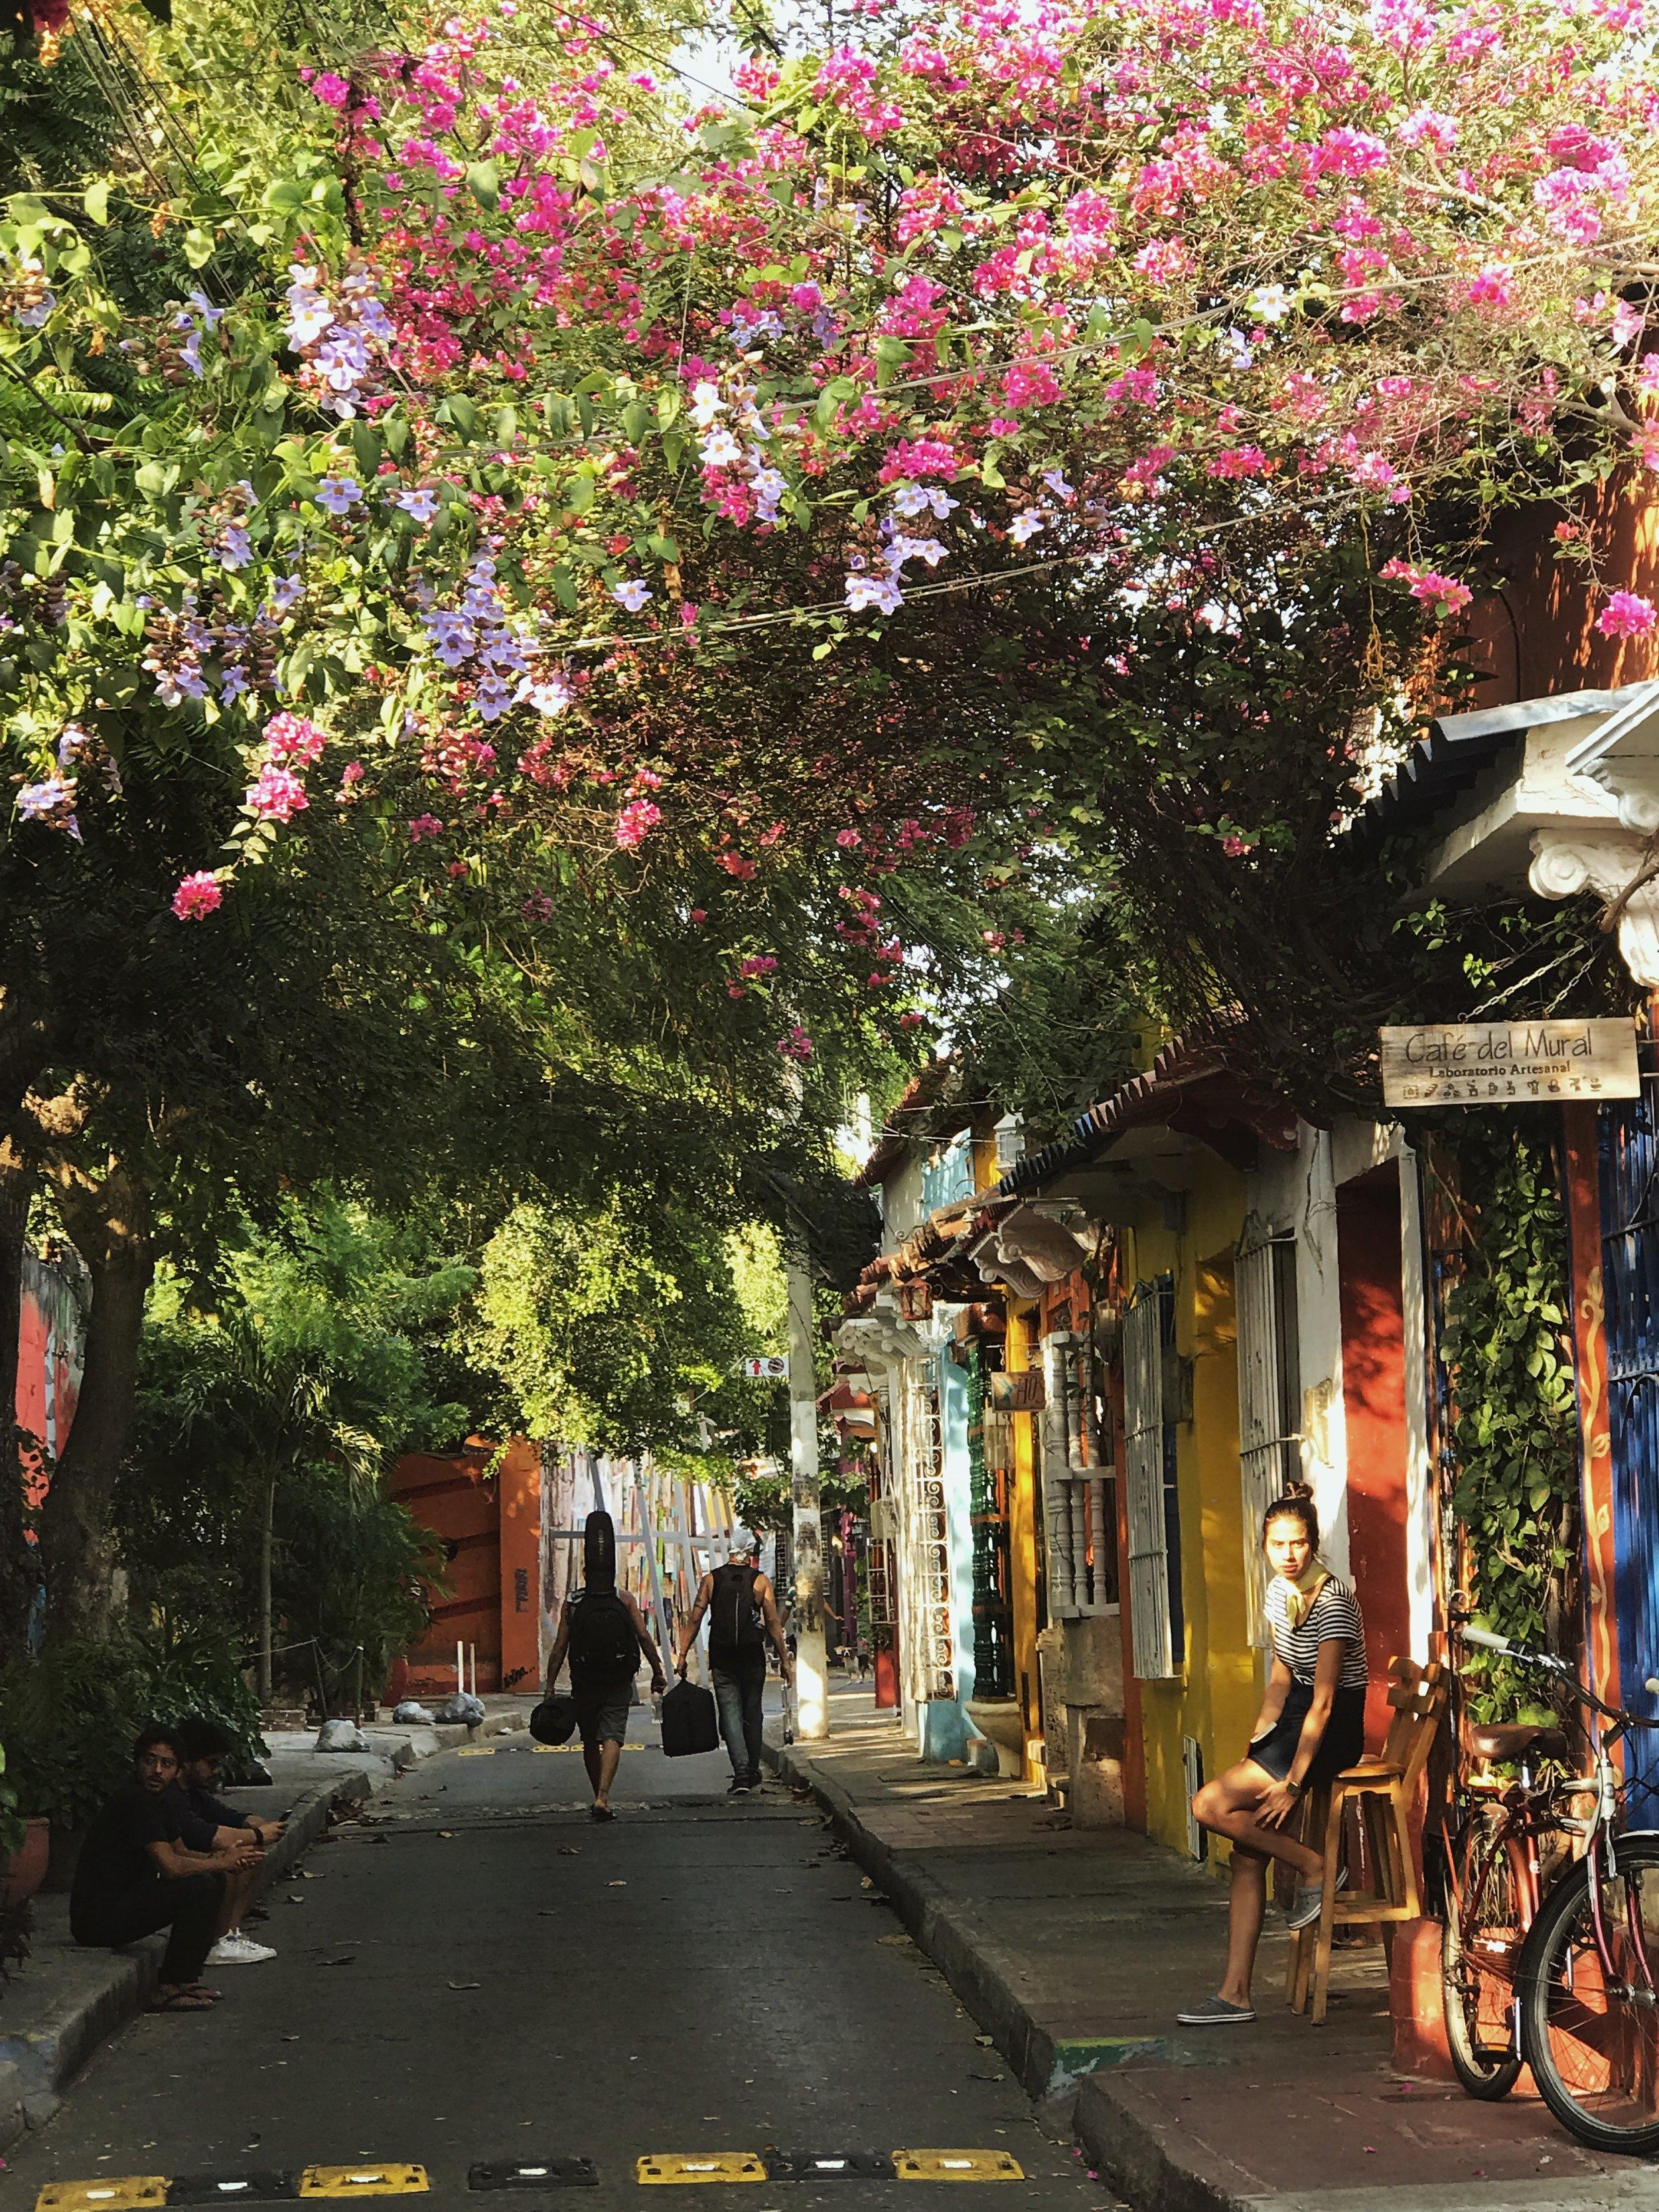 Marthadahhling Where to Stay Cartagena Getsemani .jpg